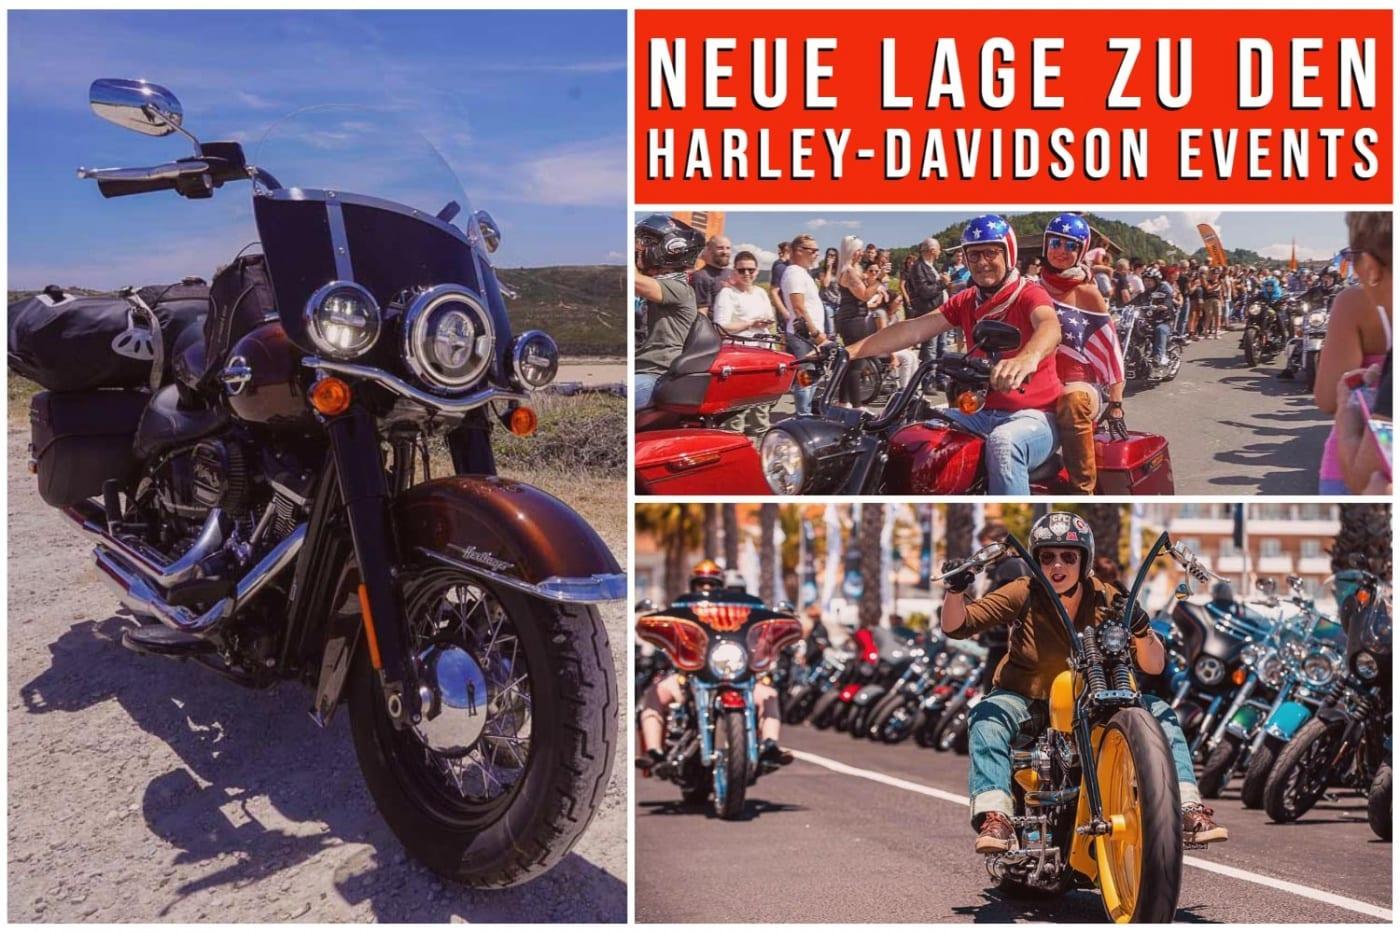 CORONA UPDATE - Harley-Davidson Events